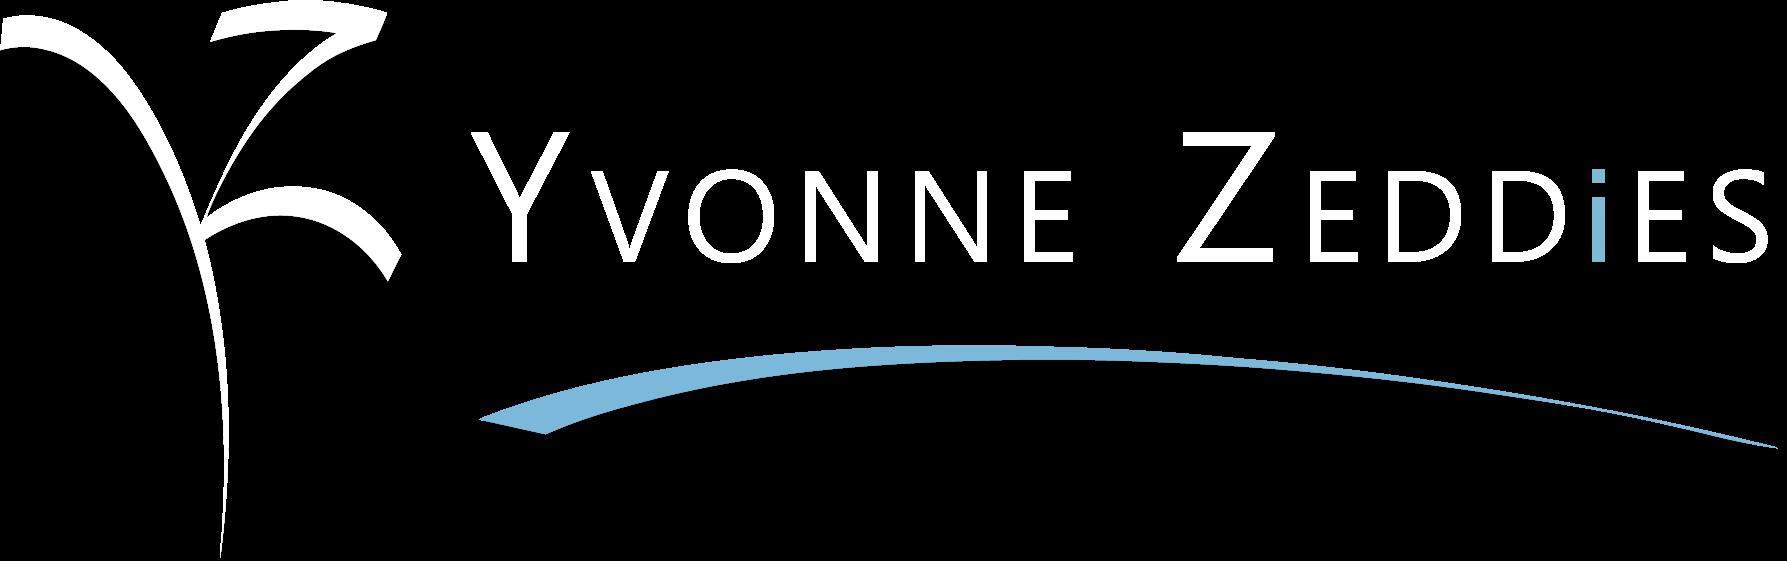 Yvonne Zeddies